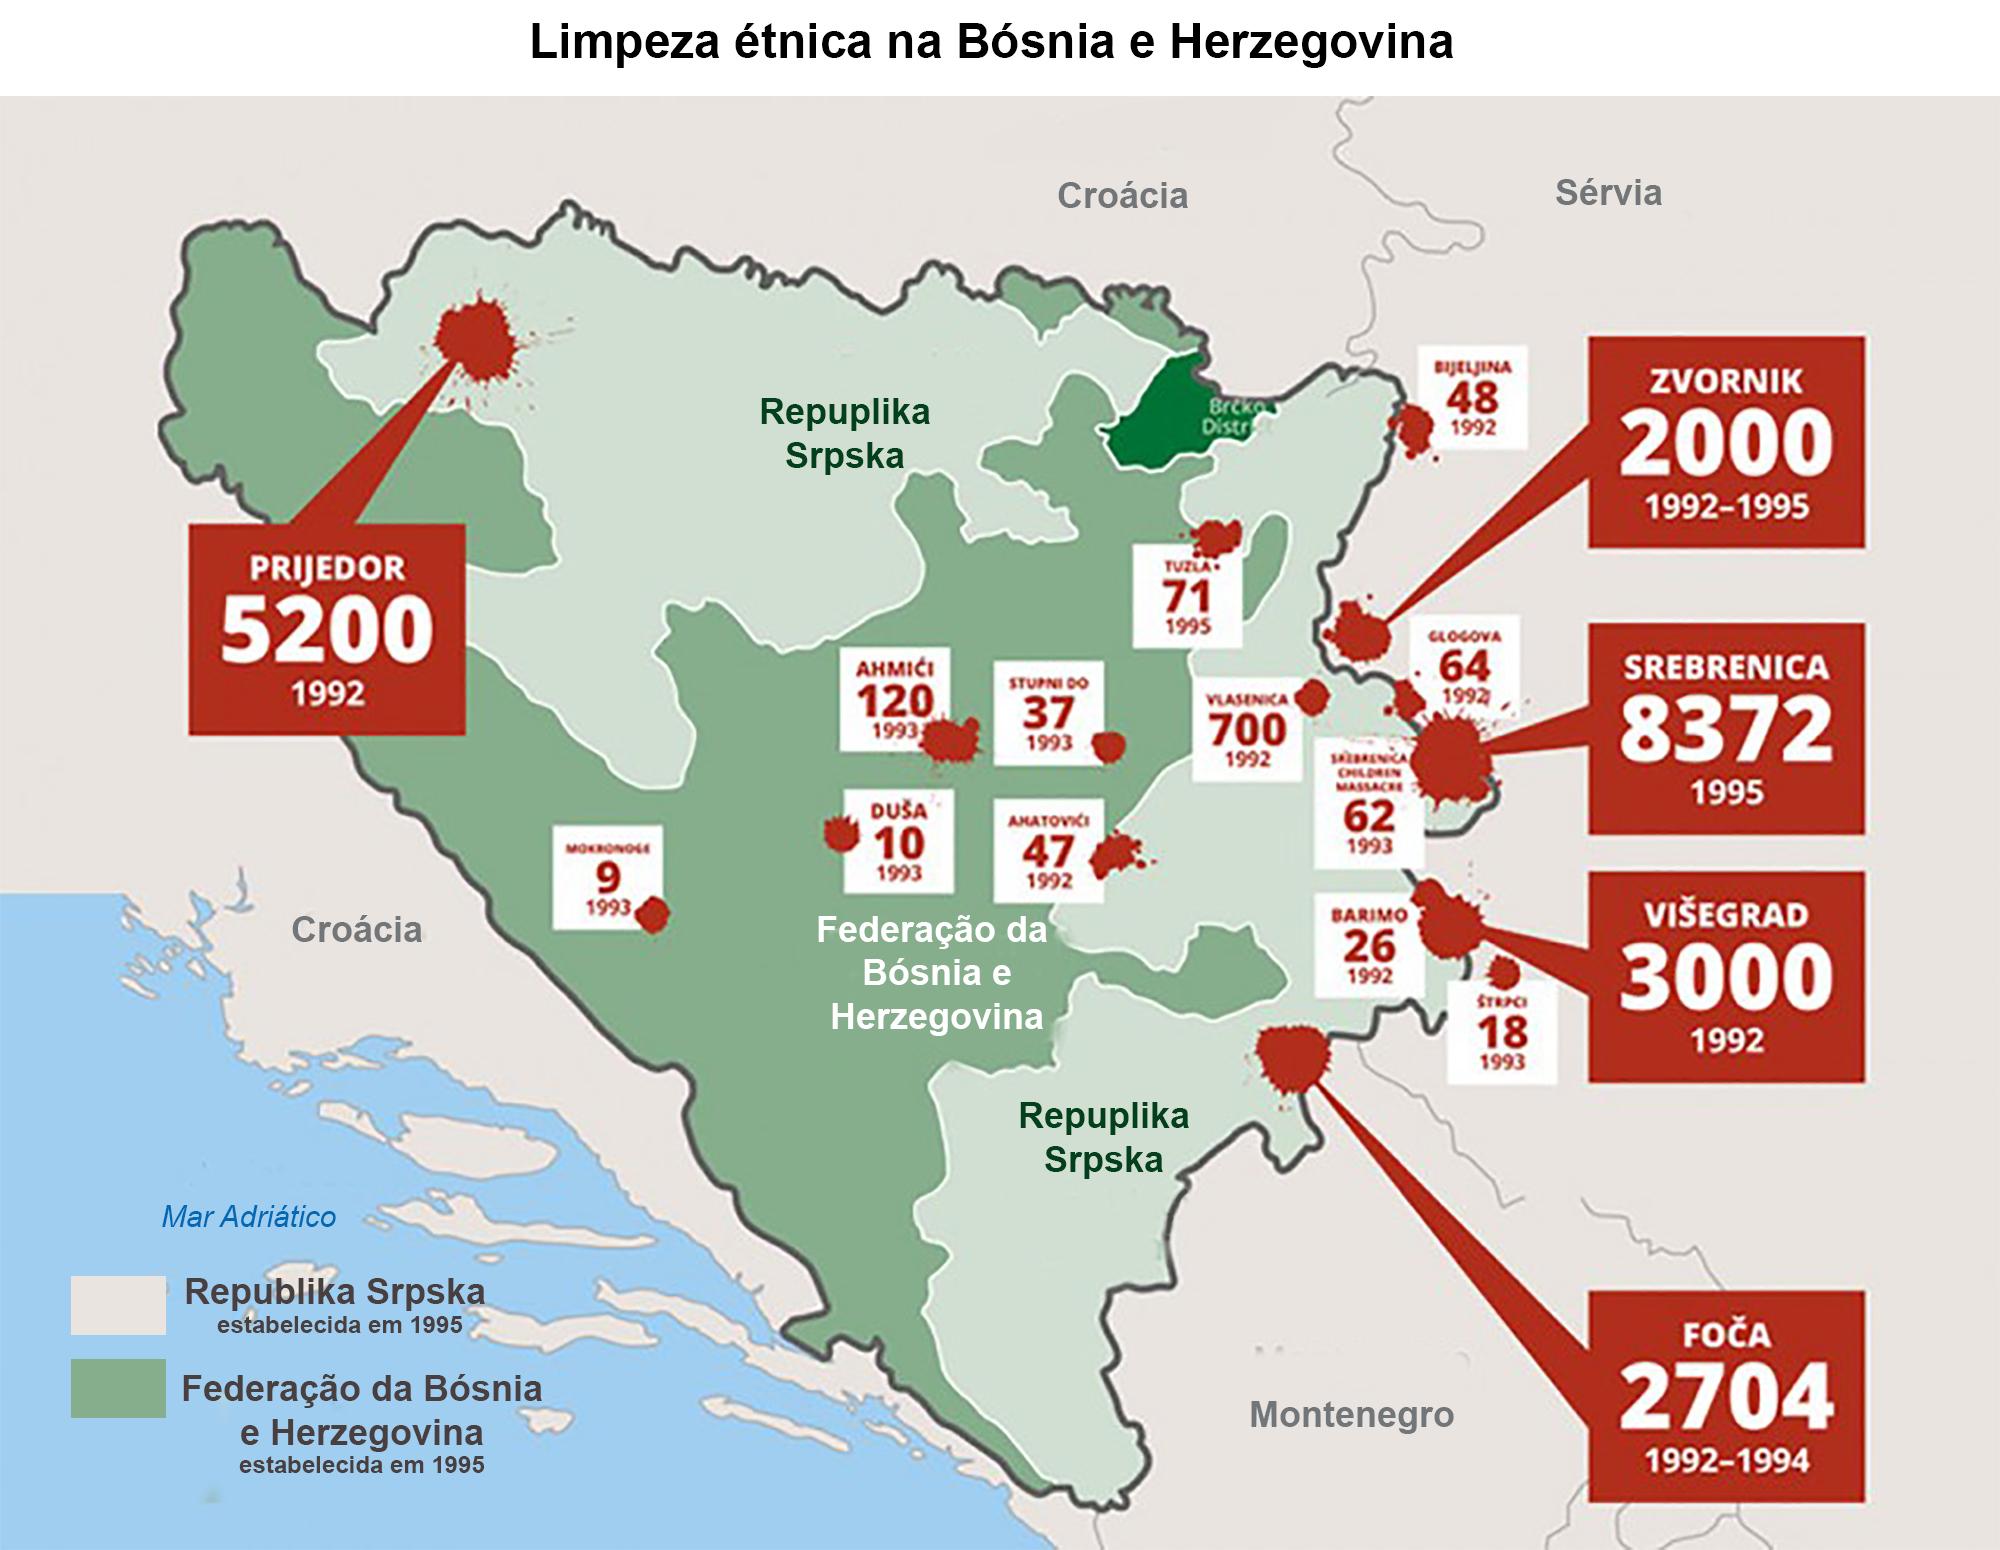 Limpeza étnica na Bósnia e Herzegovina